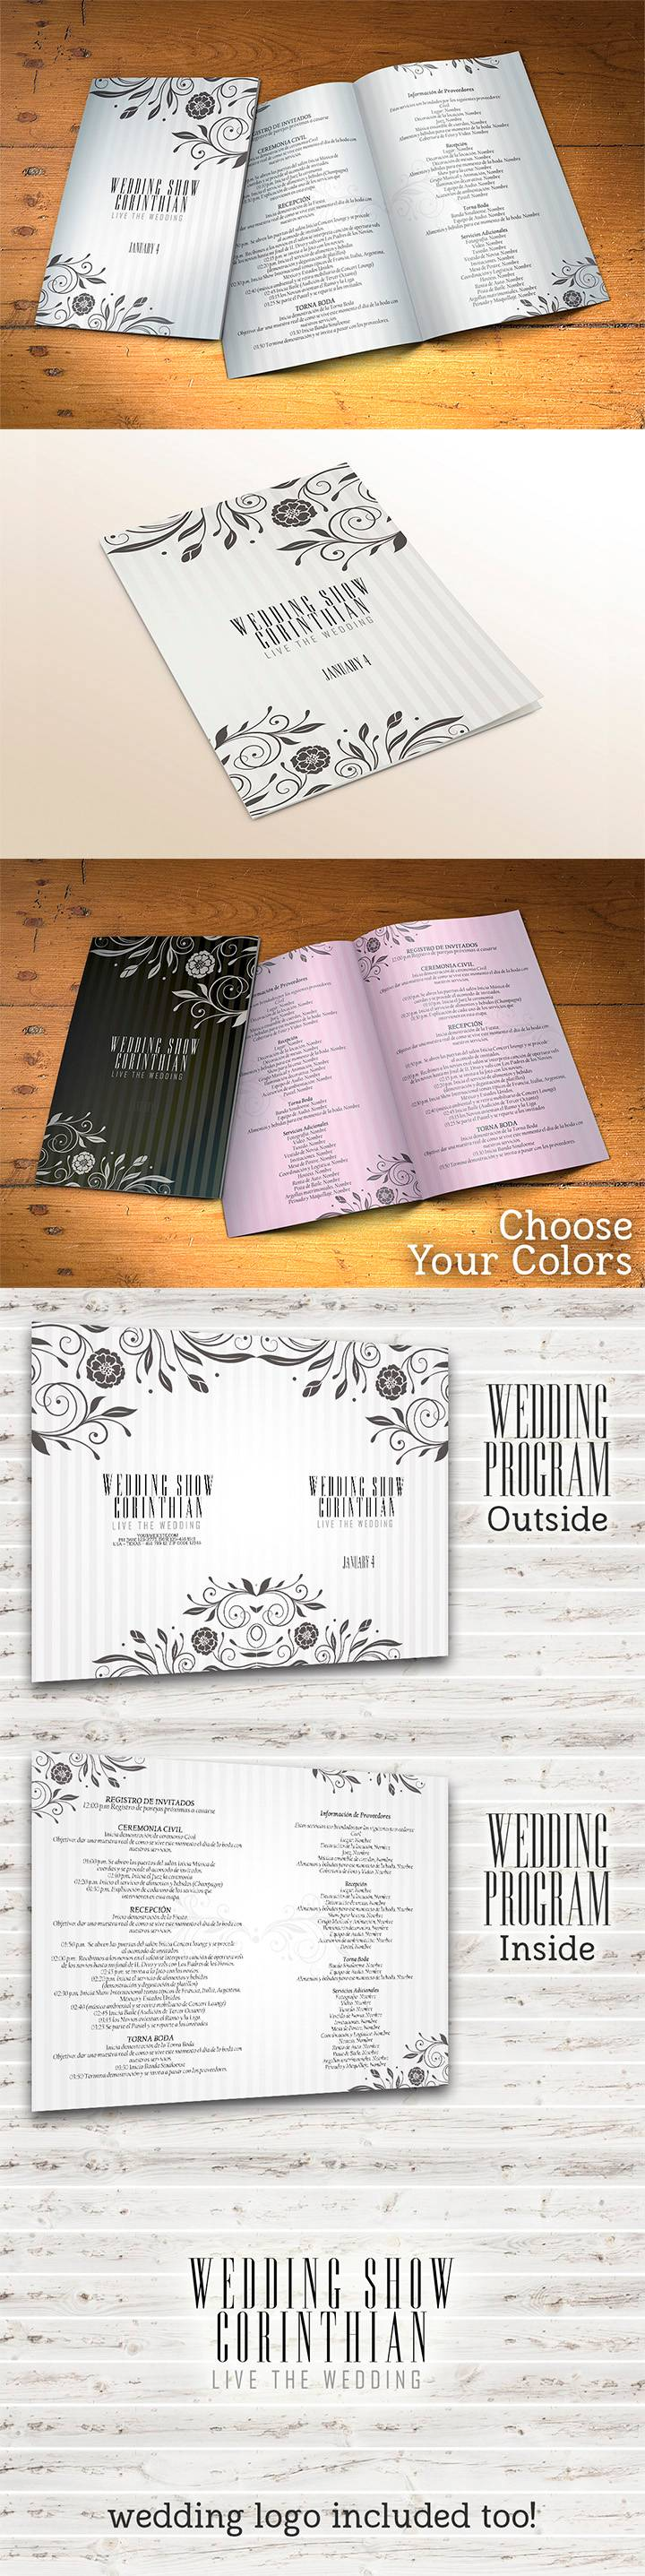 Wedding Program Template Psd